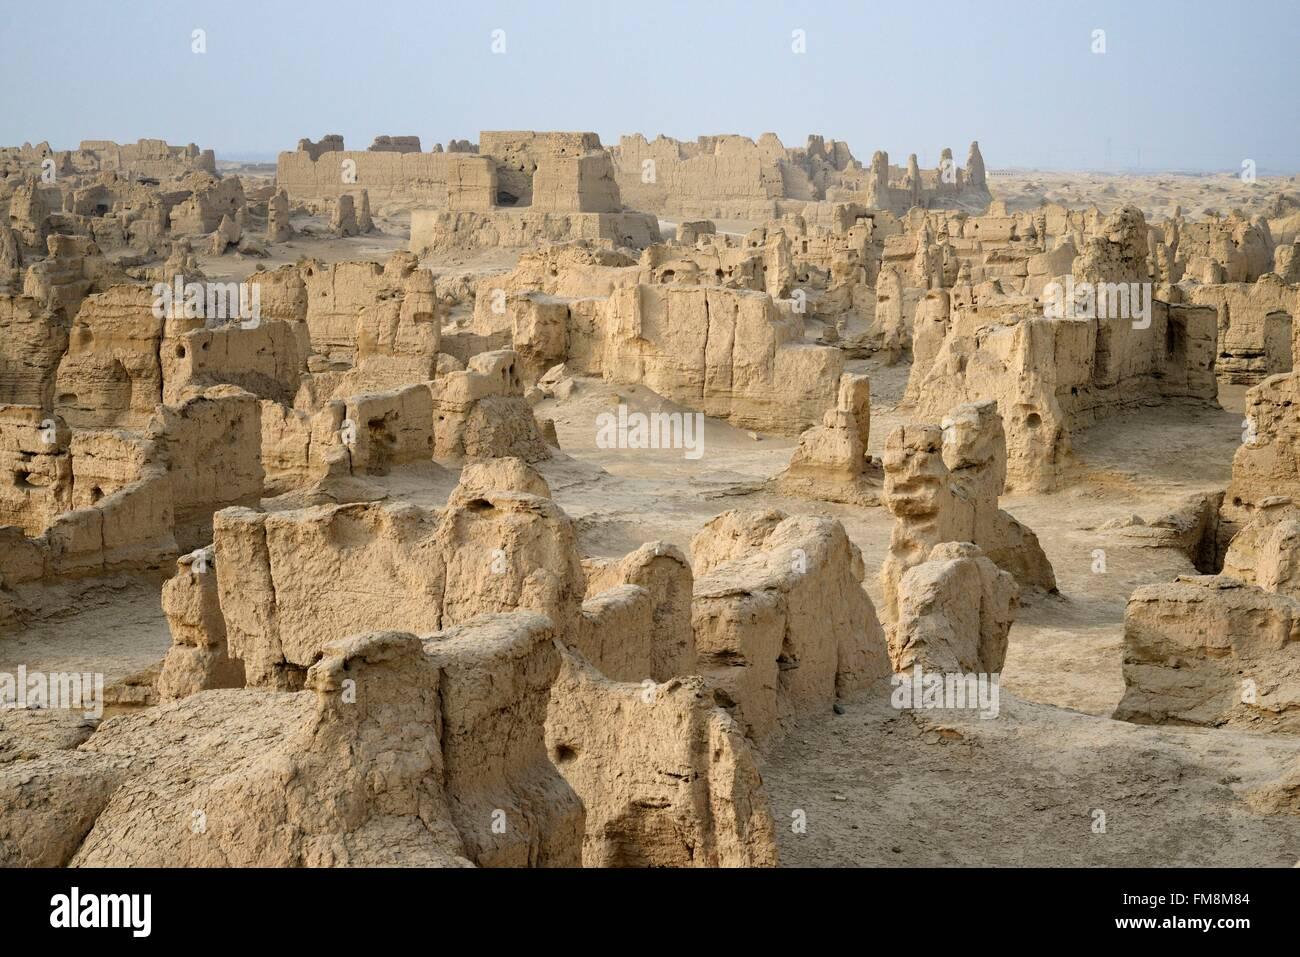 China, Xinjiang Uyghur Autonomous Region, Turpan (Turfan, Tulufan), Jiaohe Ruins, listed as World Heritage by UNESCO - Stock Image